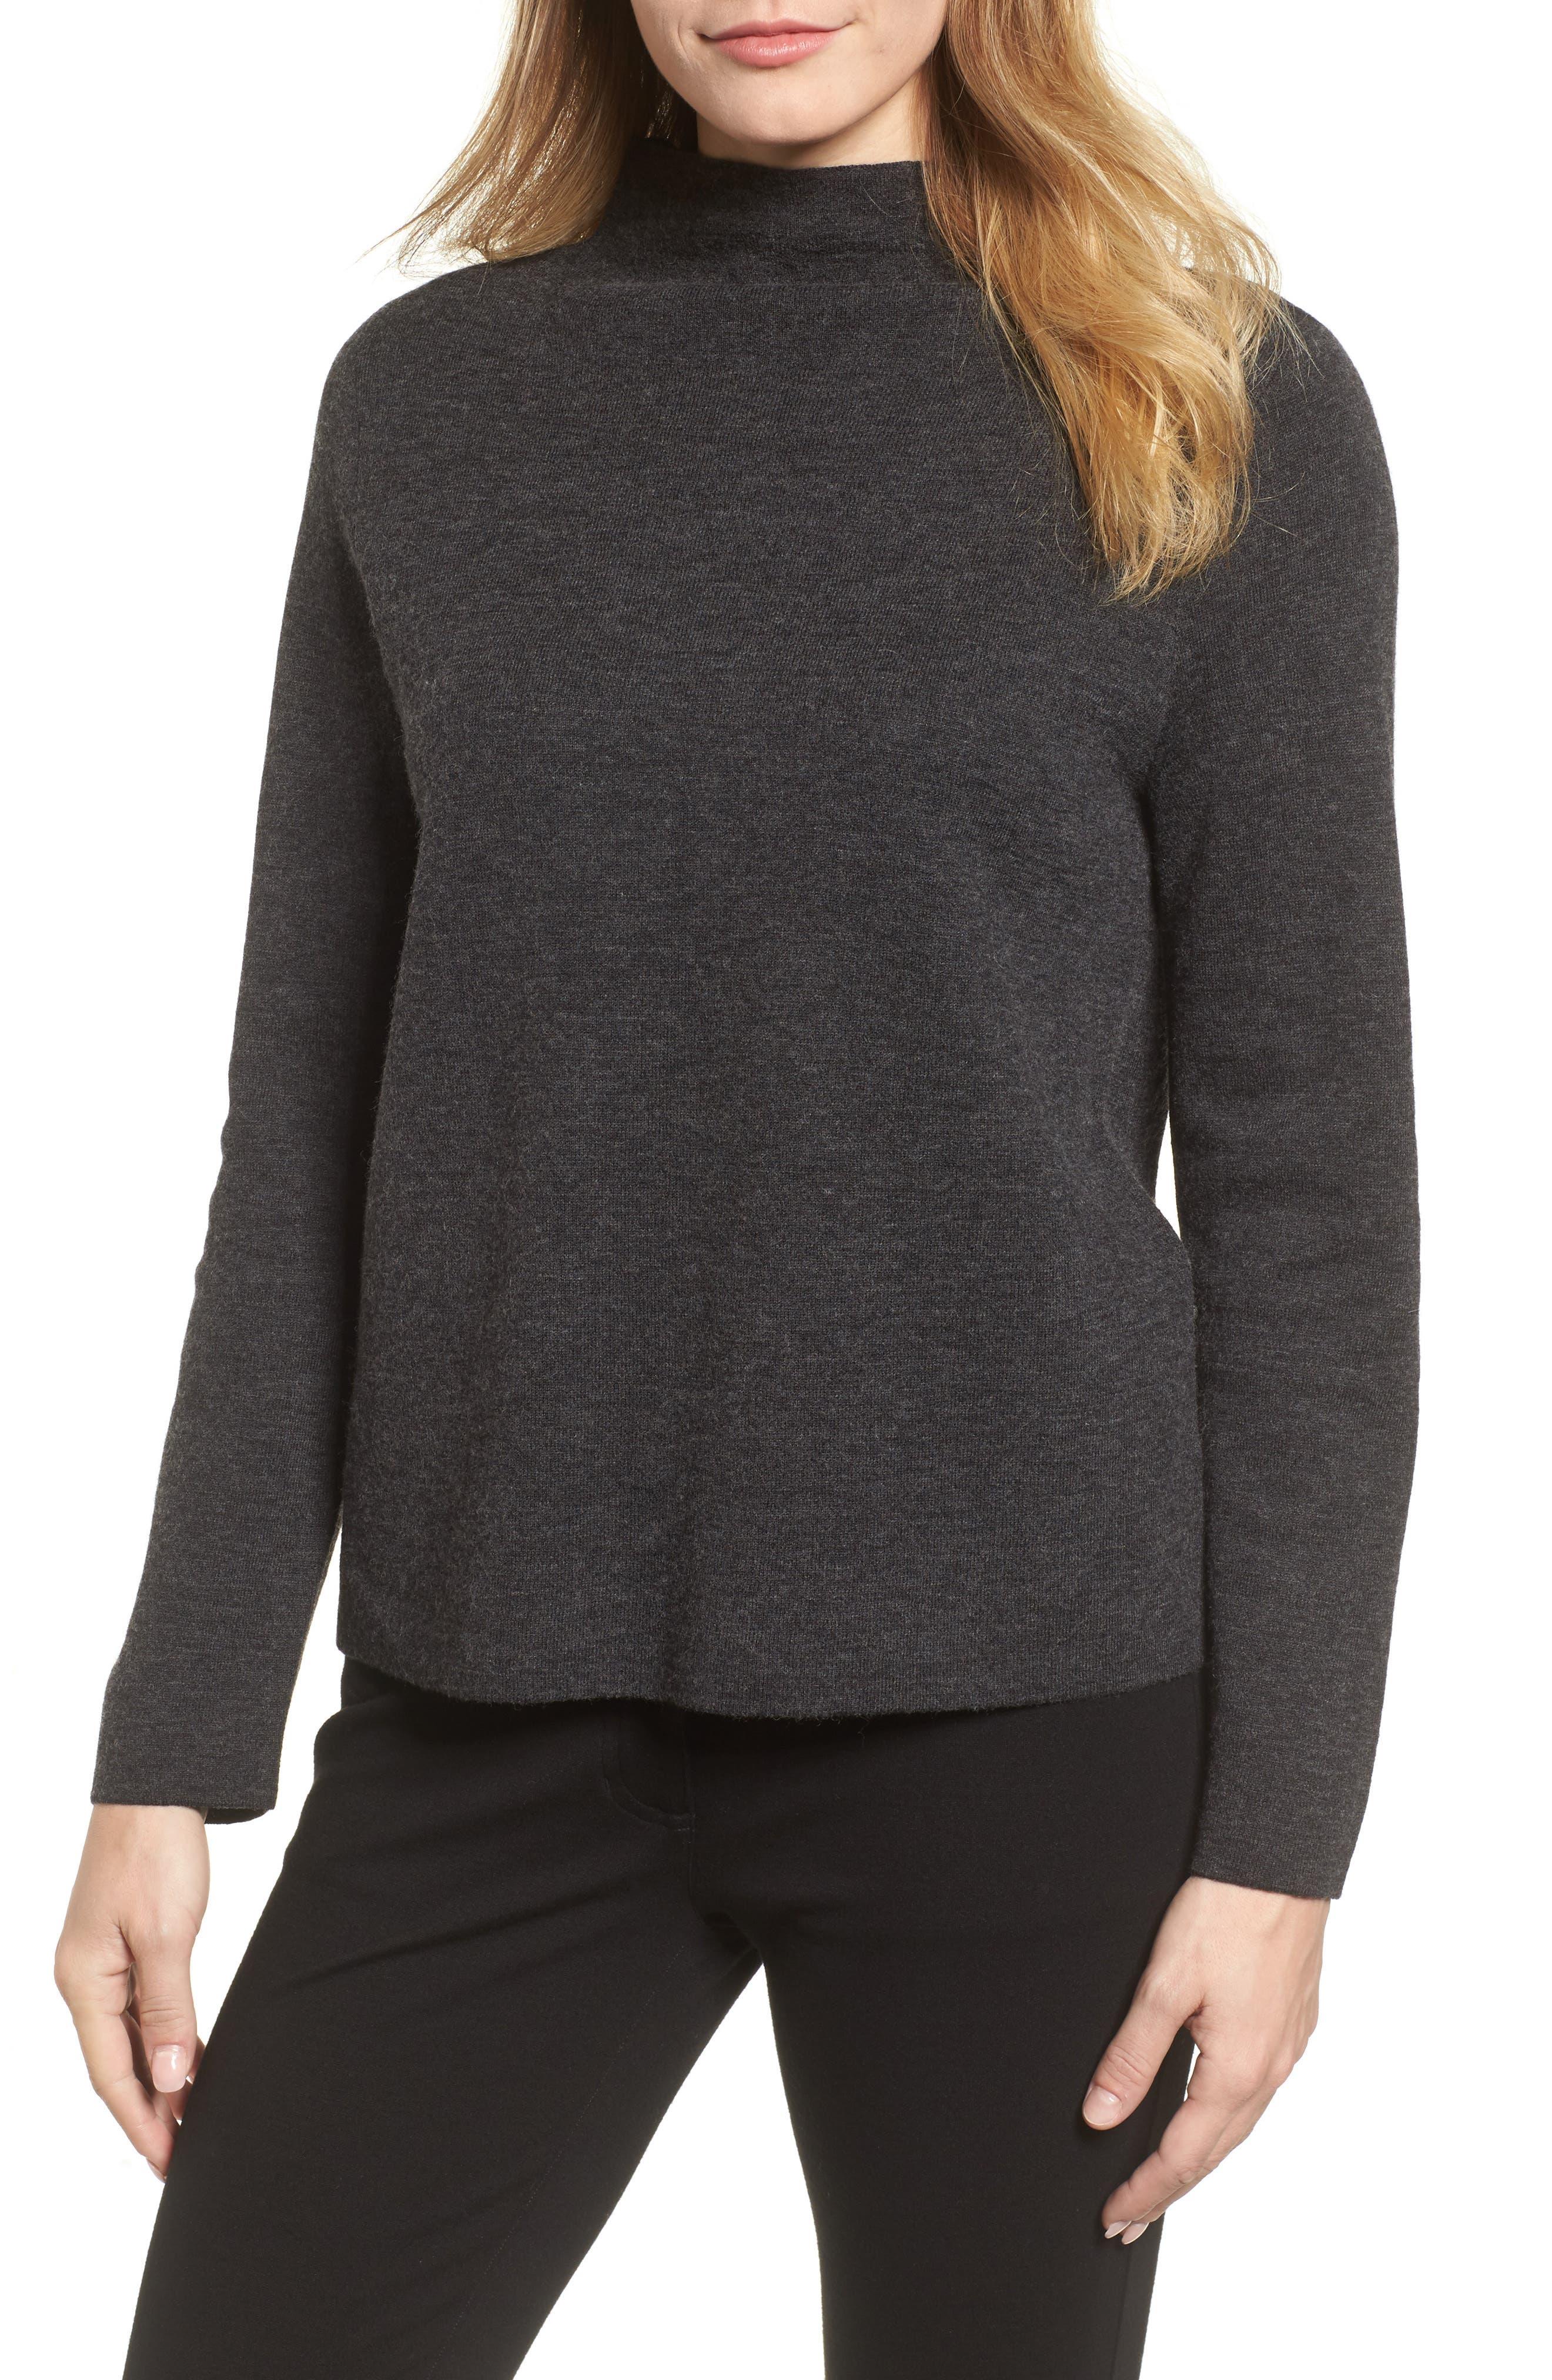 Alternate Image 1 Selected - Eileen Fisher Funnel Neck Sweater (Regular & Petite)